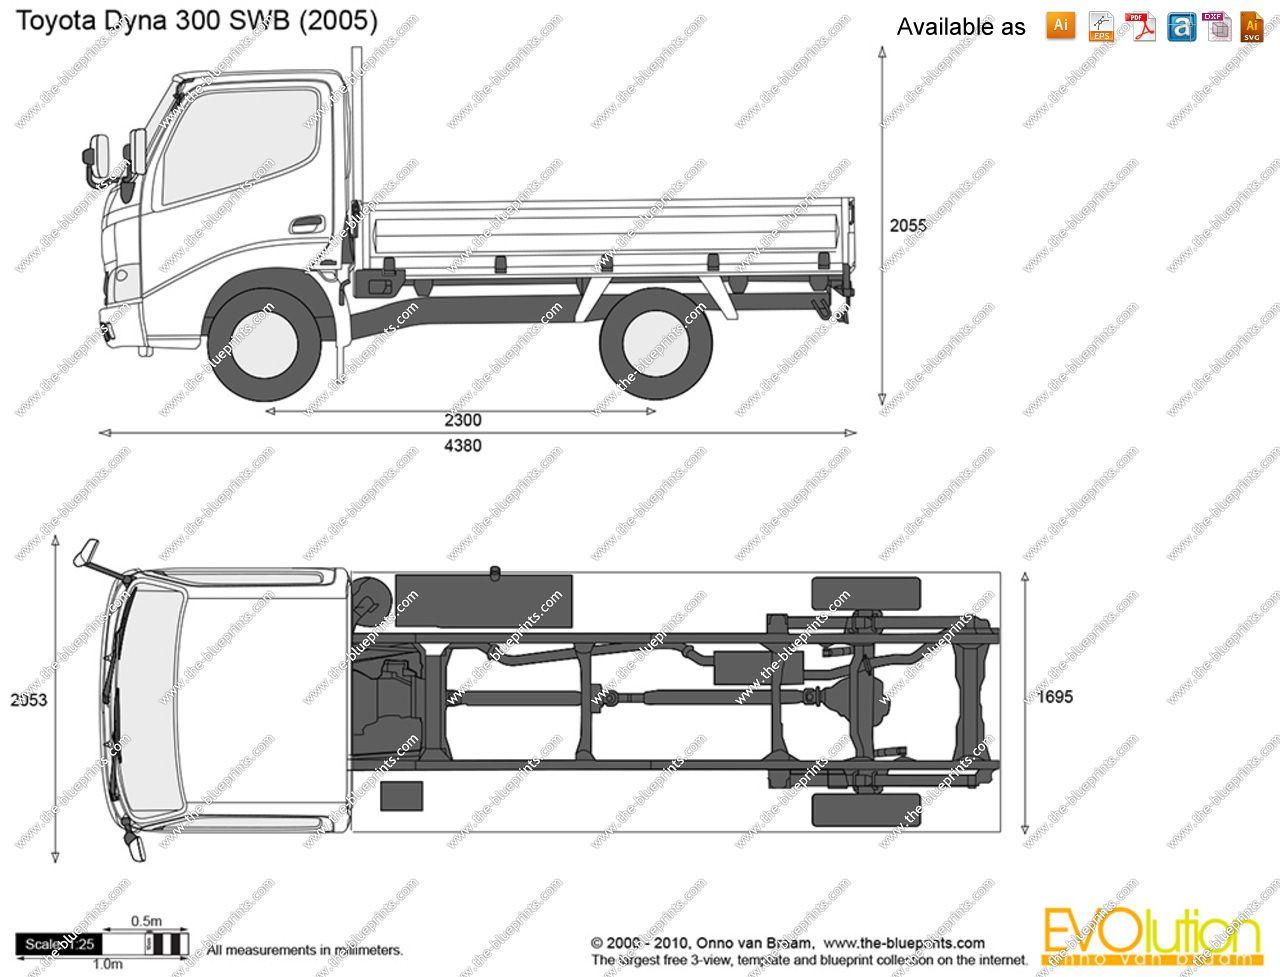 medium resolution of toyota dyna truck dimensions 7